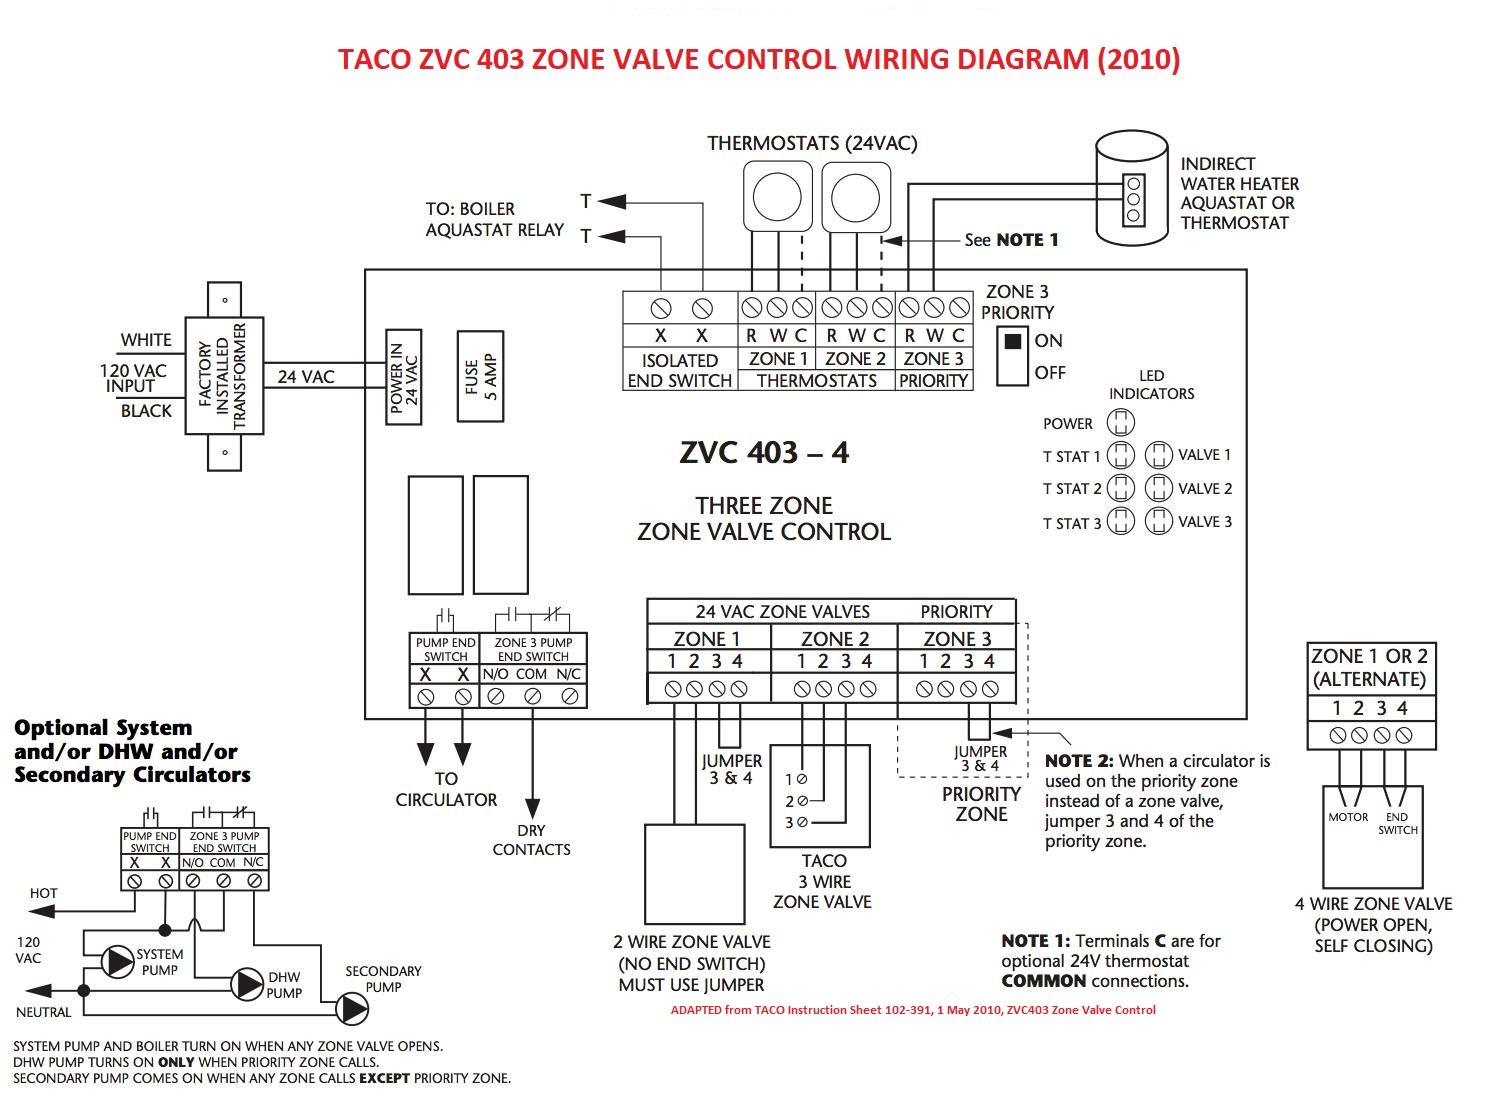 taco 006 wiring diagram schematic diagram 2-Port Valve Wiring Diagram taco 006 wiring diagram wiring data diagram taco piping diagrams taco 006 wiring diagram manual e